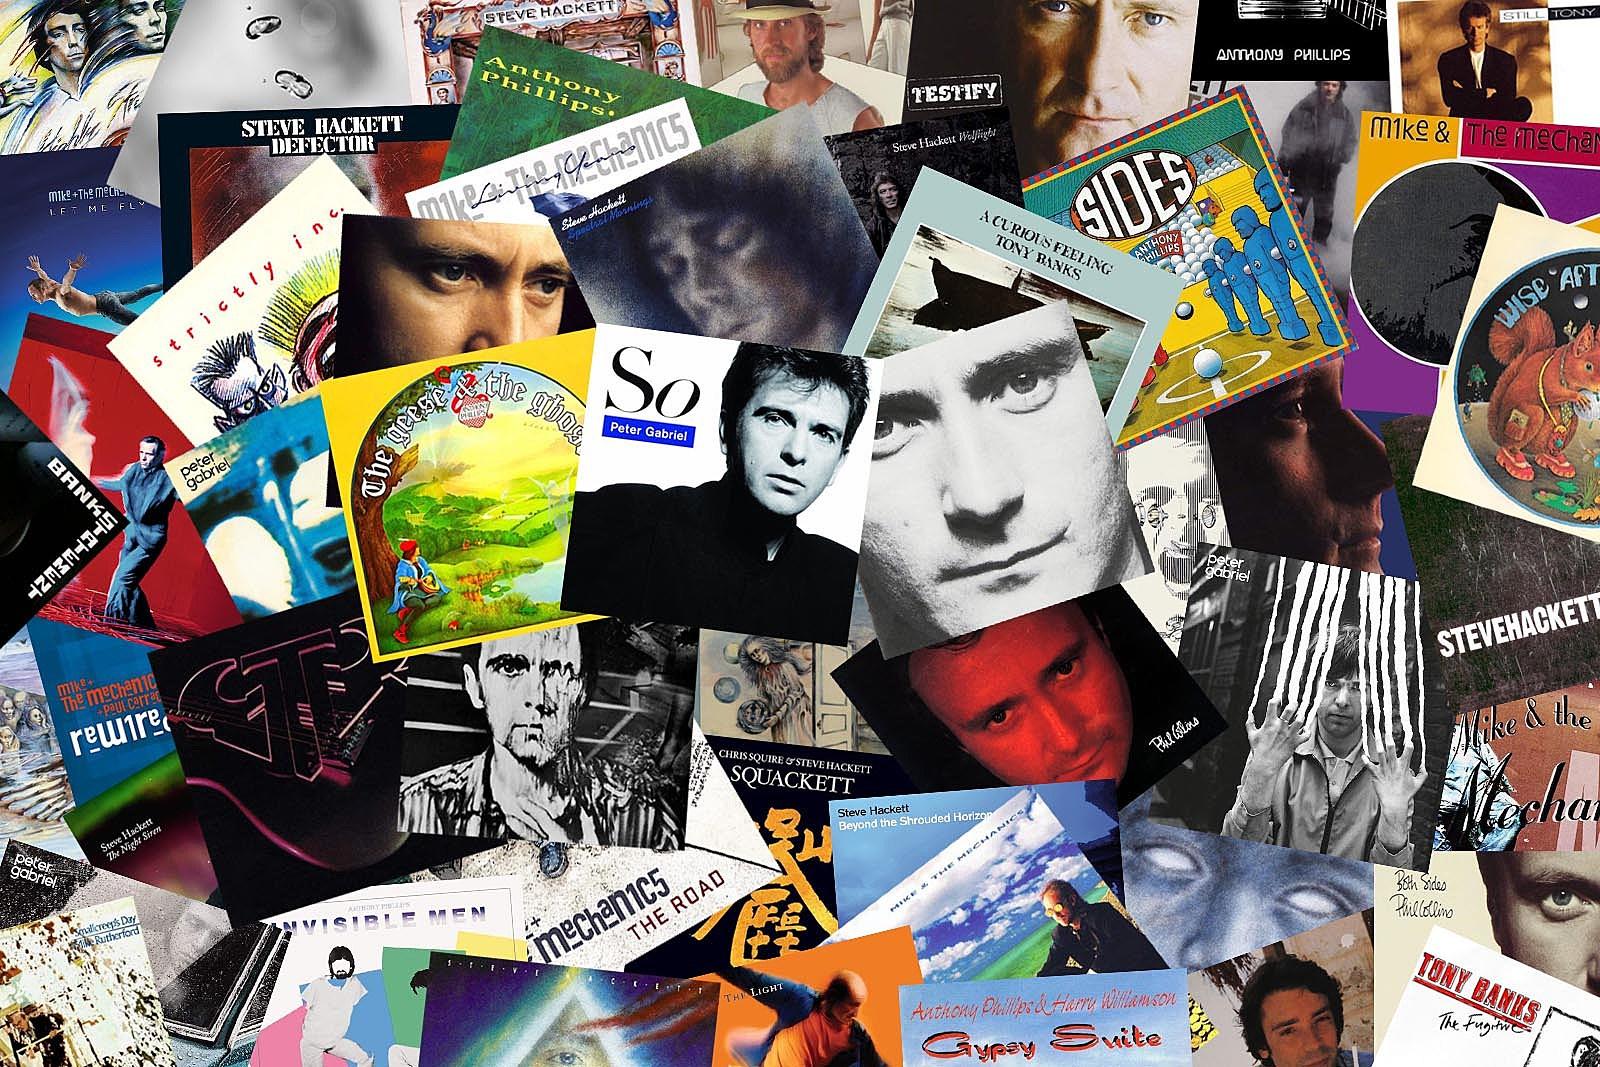 the singles 1992 no doubt torrent